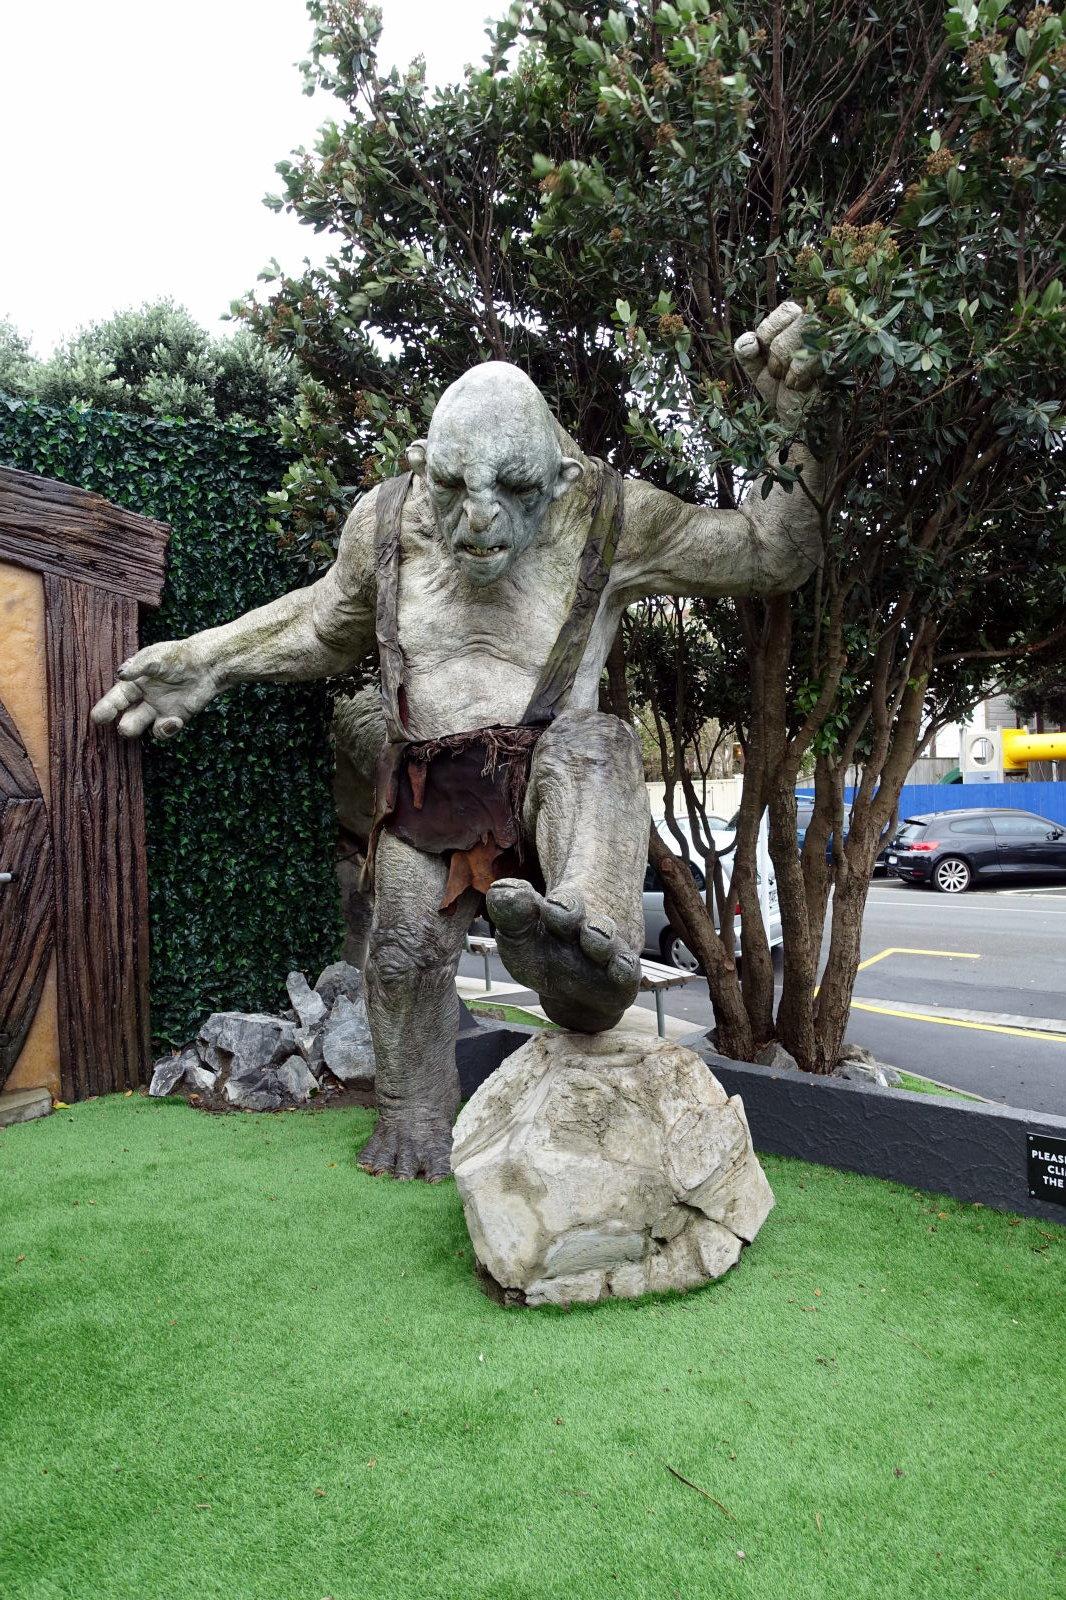 A big figure of a troll